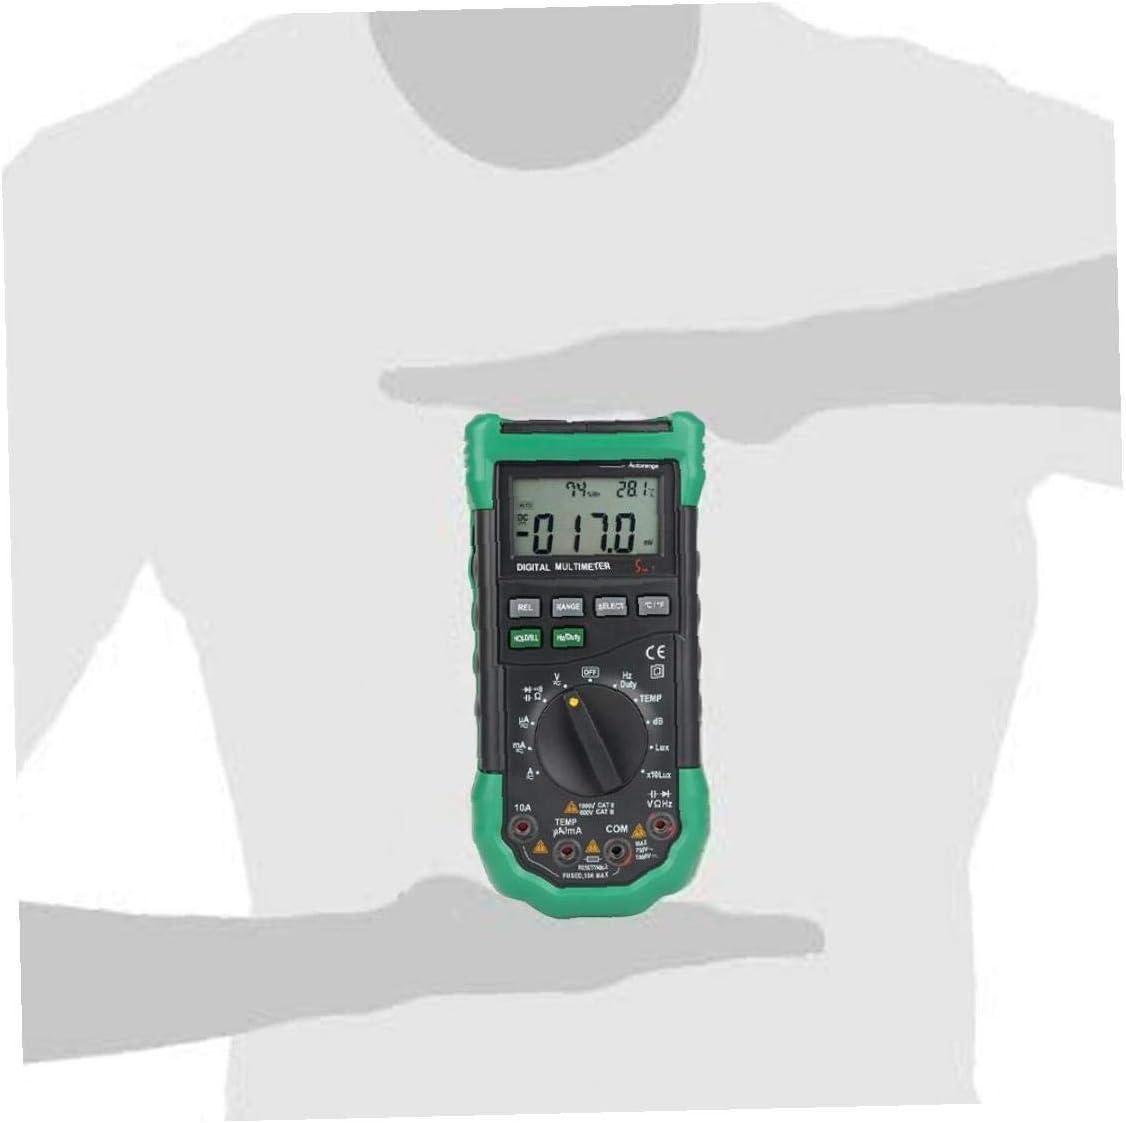 Digital Multimeter Tester Multimeter Continuity Tester Multi Tester Electrical Ms8229 Digital Multimeter for Electrician Green